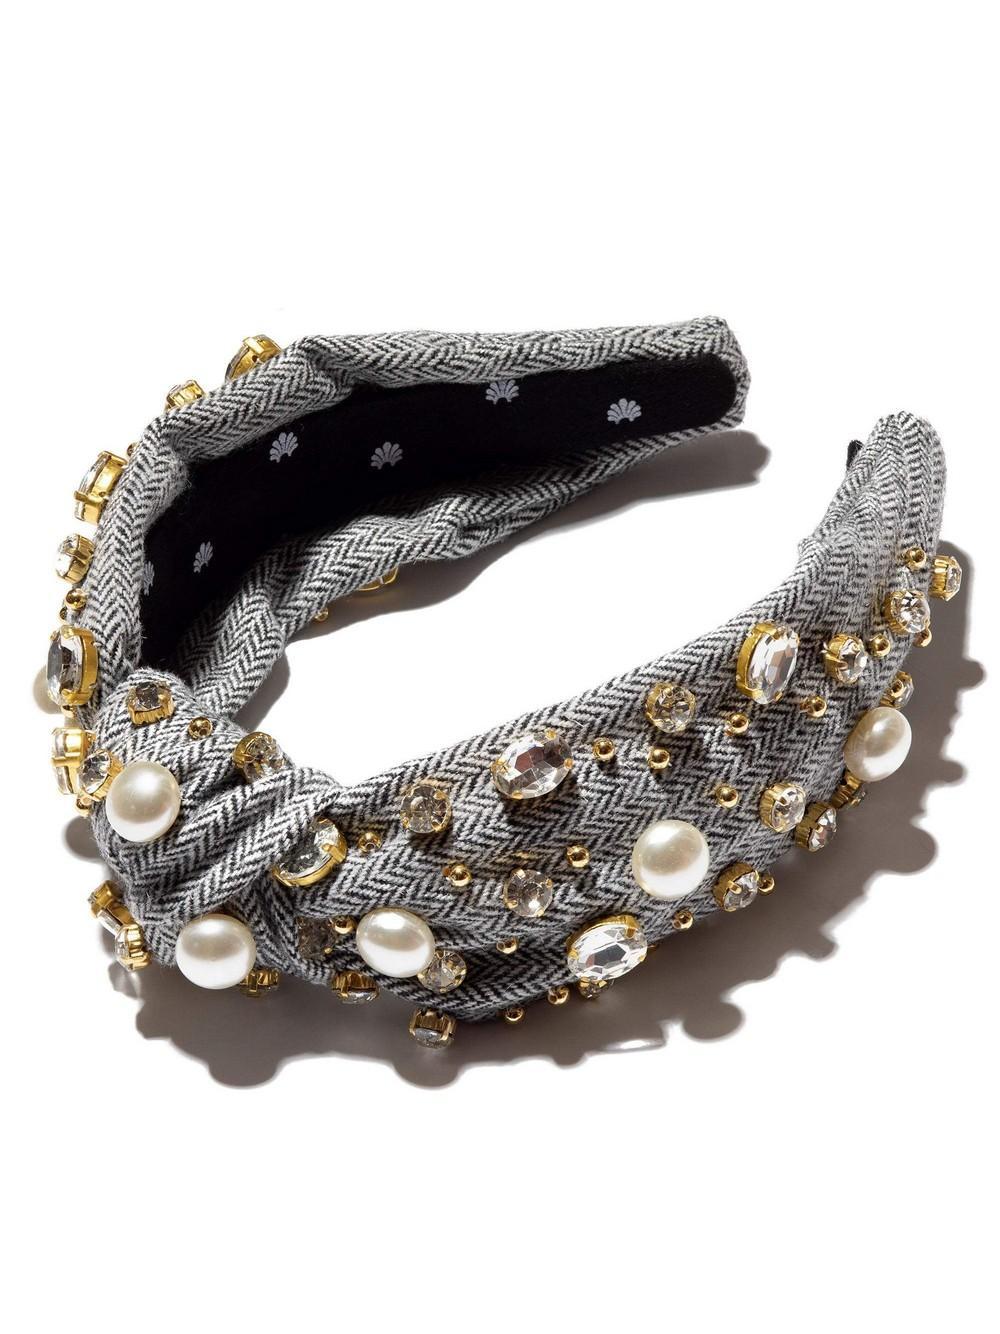 Oversized Tweed Pearl And Crystal Headband Item # LSHA181BW